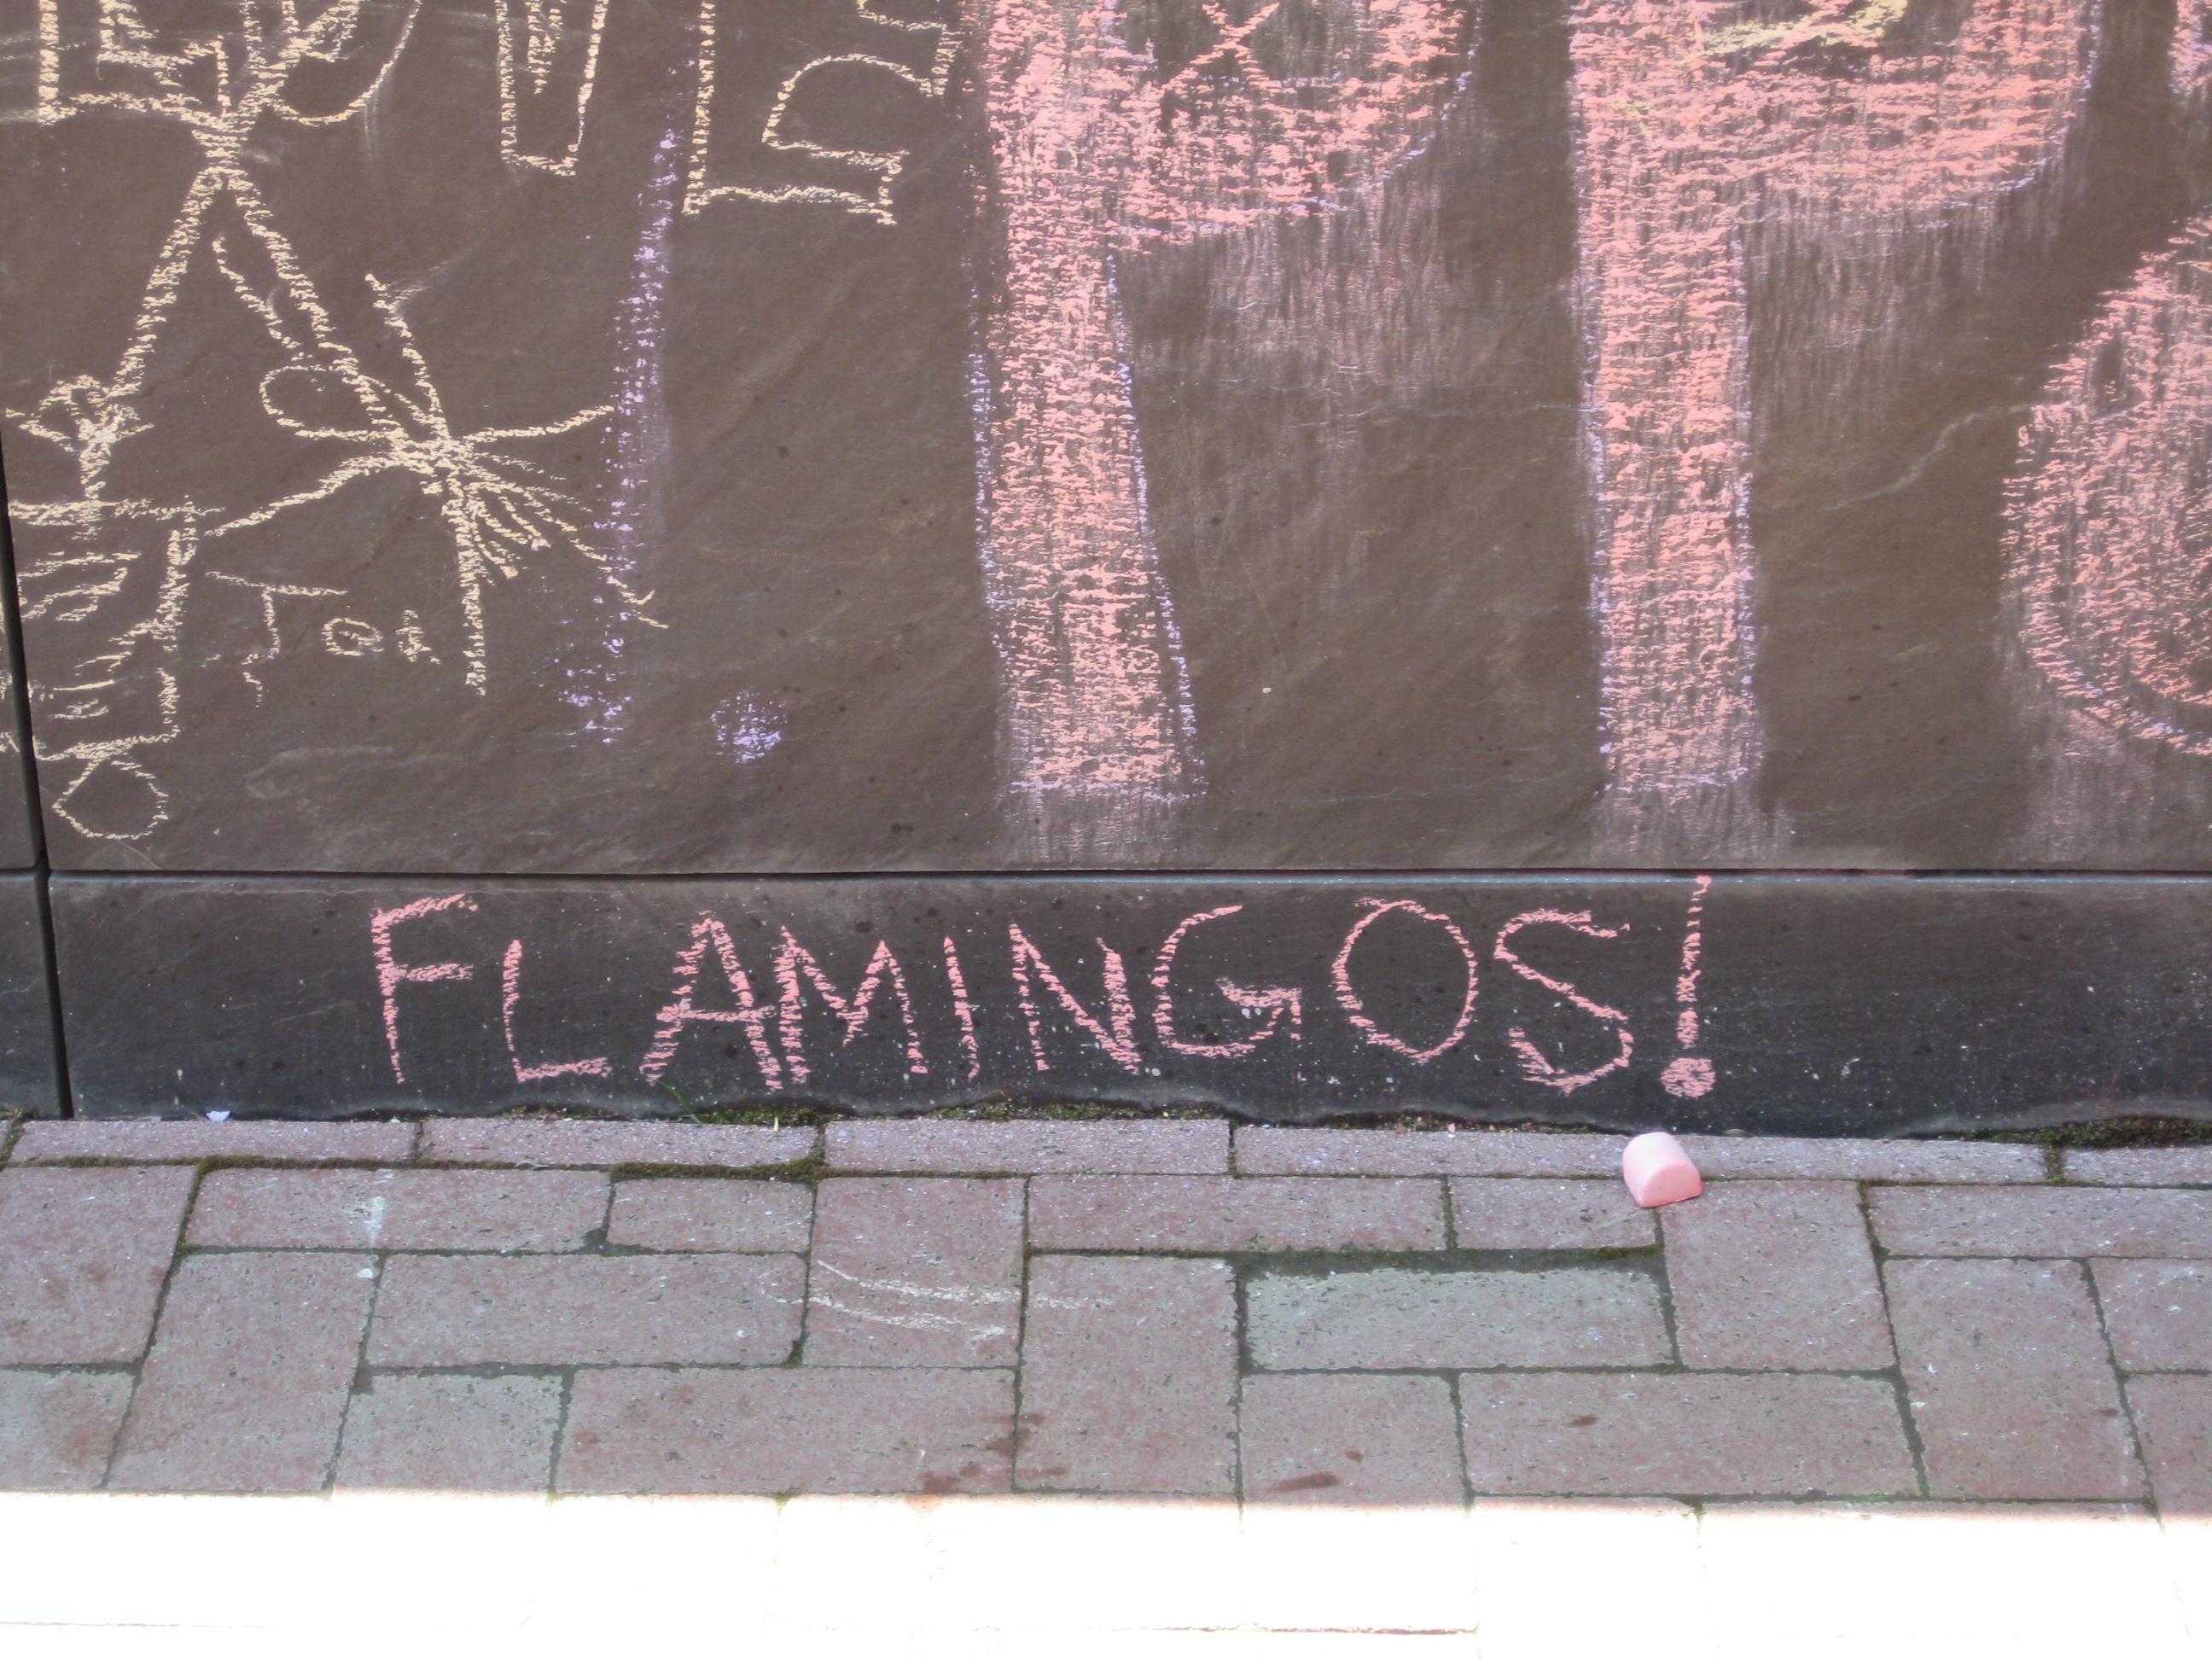 Flamingos! on the chalkboard.